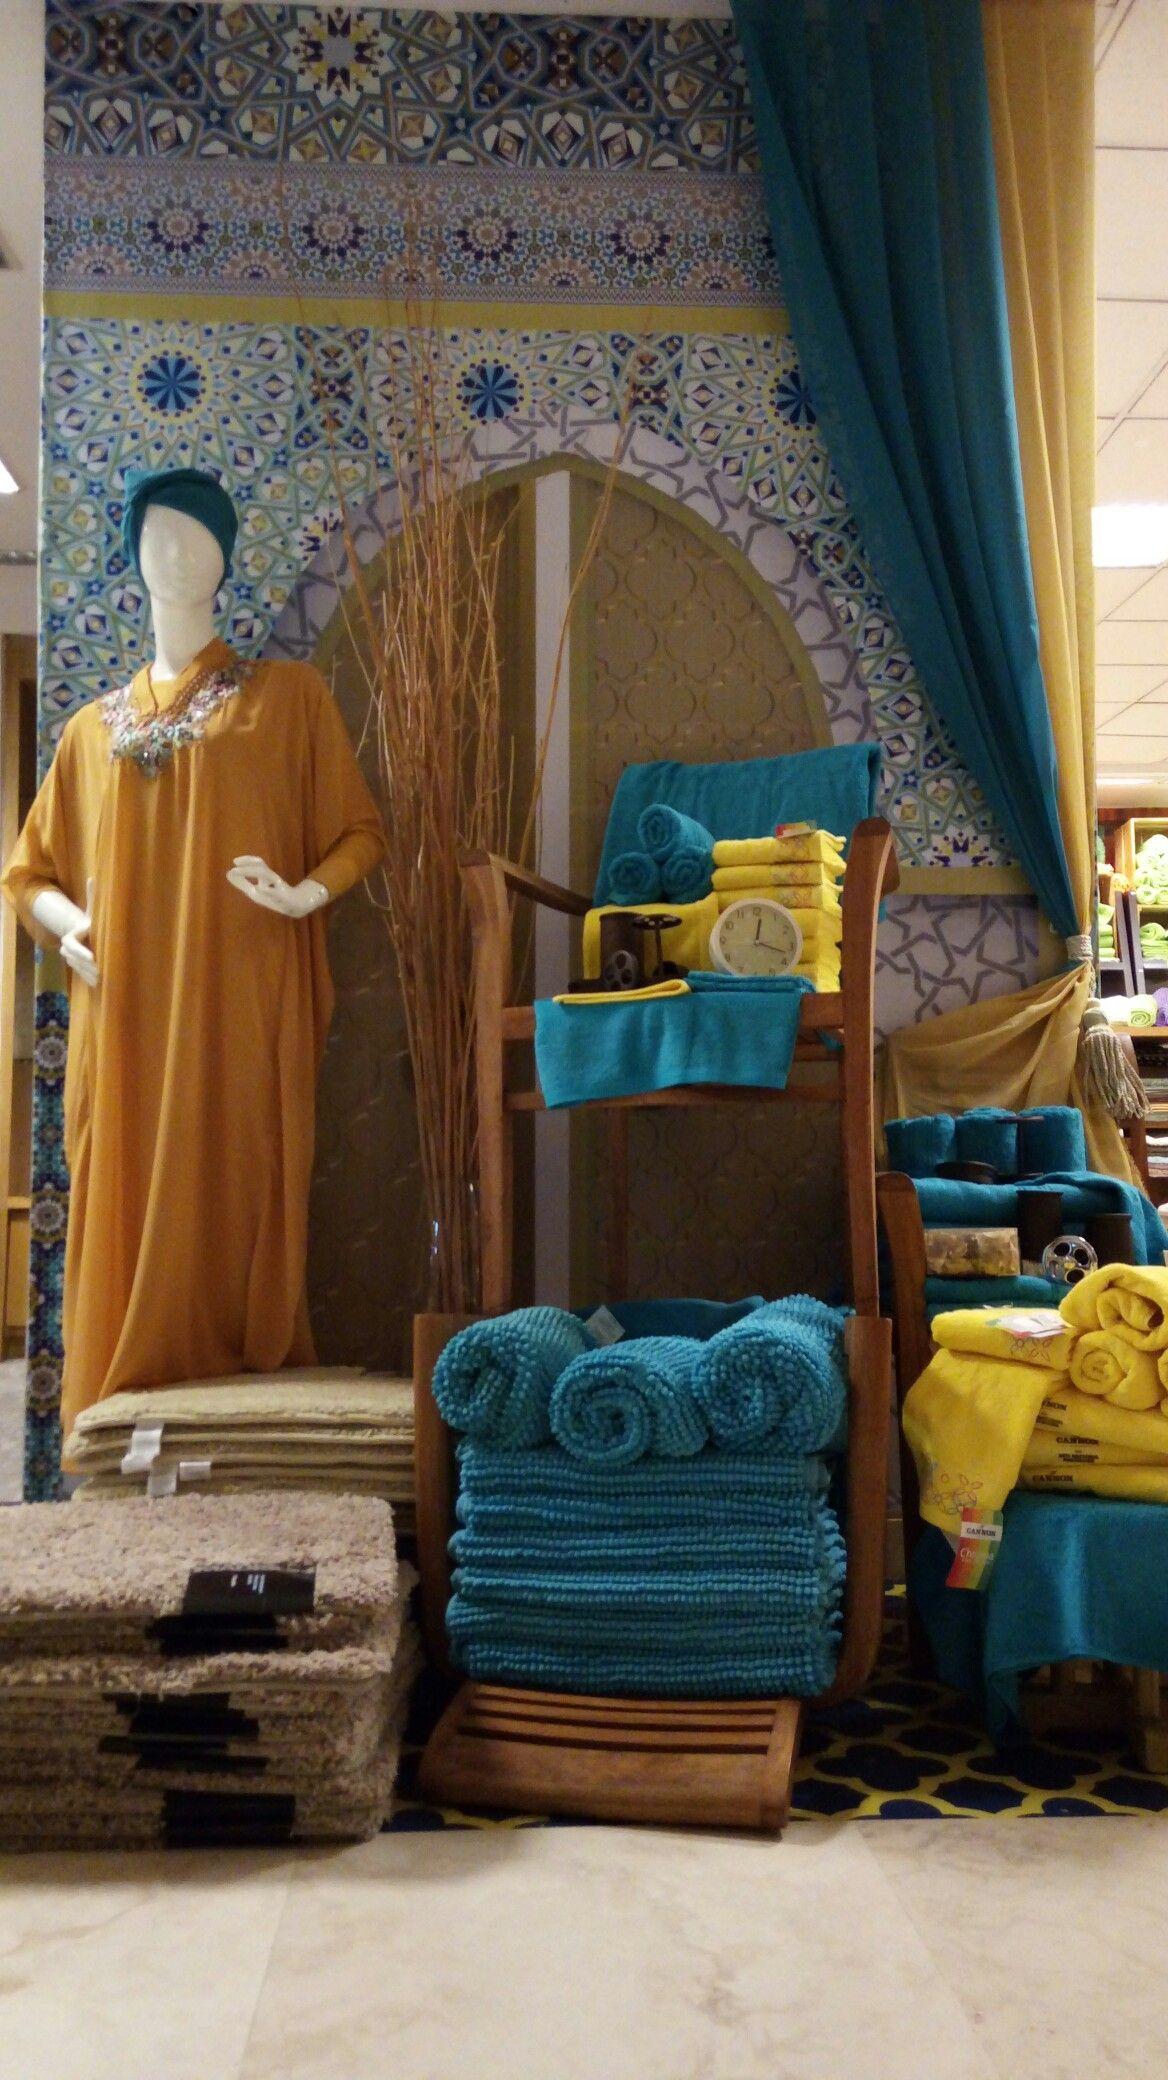 #visual #merchandising #display #home #creative #ideas #metro #Senayan #square #indonesia